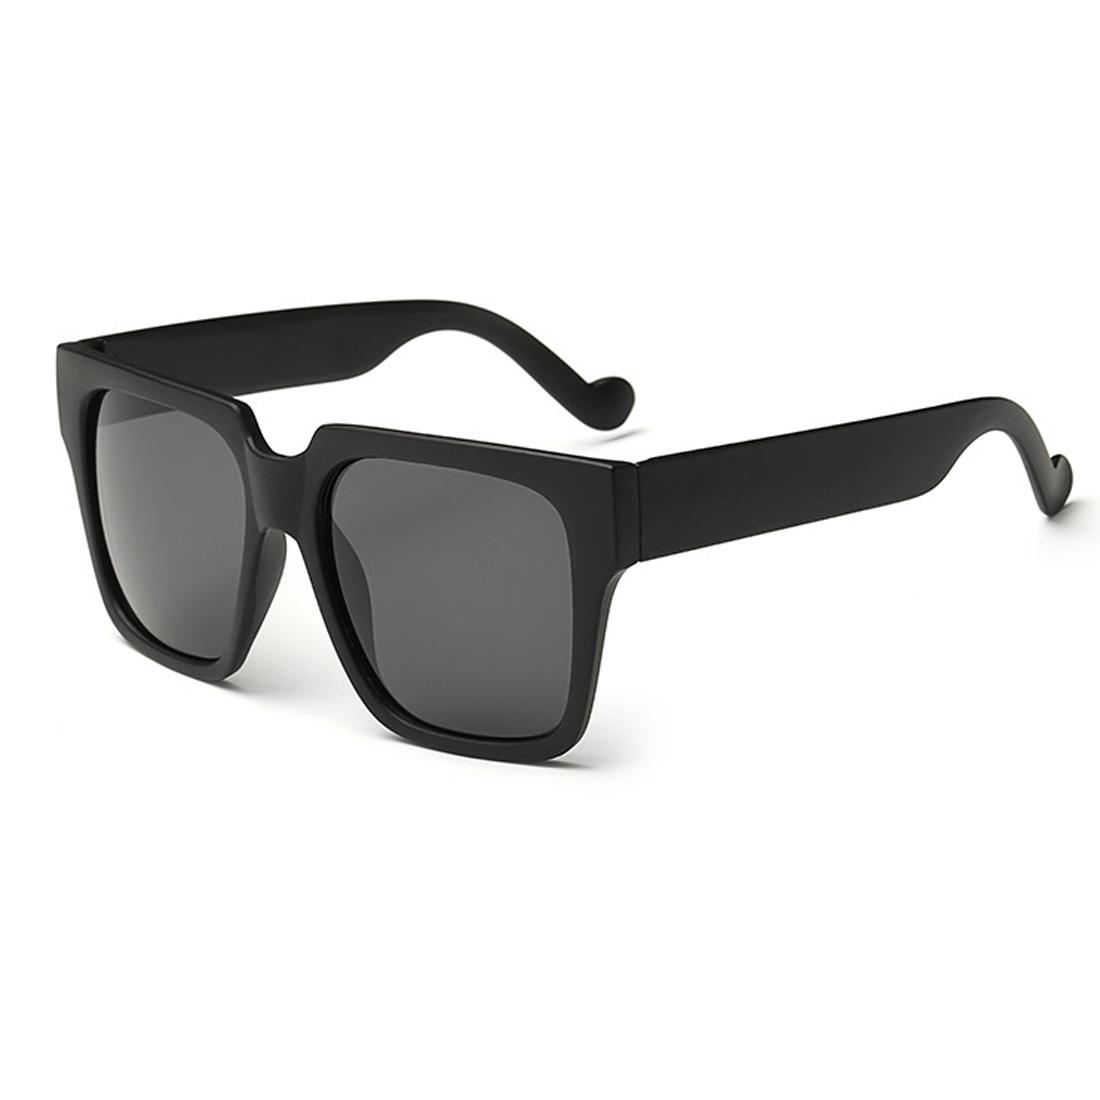 XQ-HD Ярко-черный весь серый xq hd ярко черная рамная прогрессивная пленка